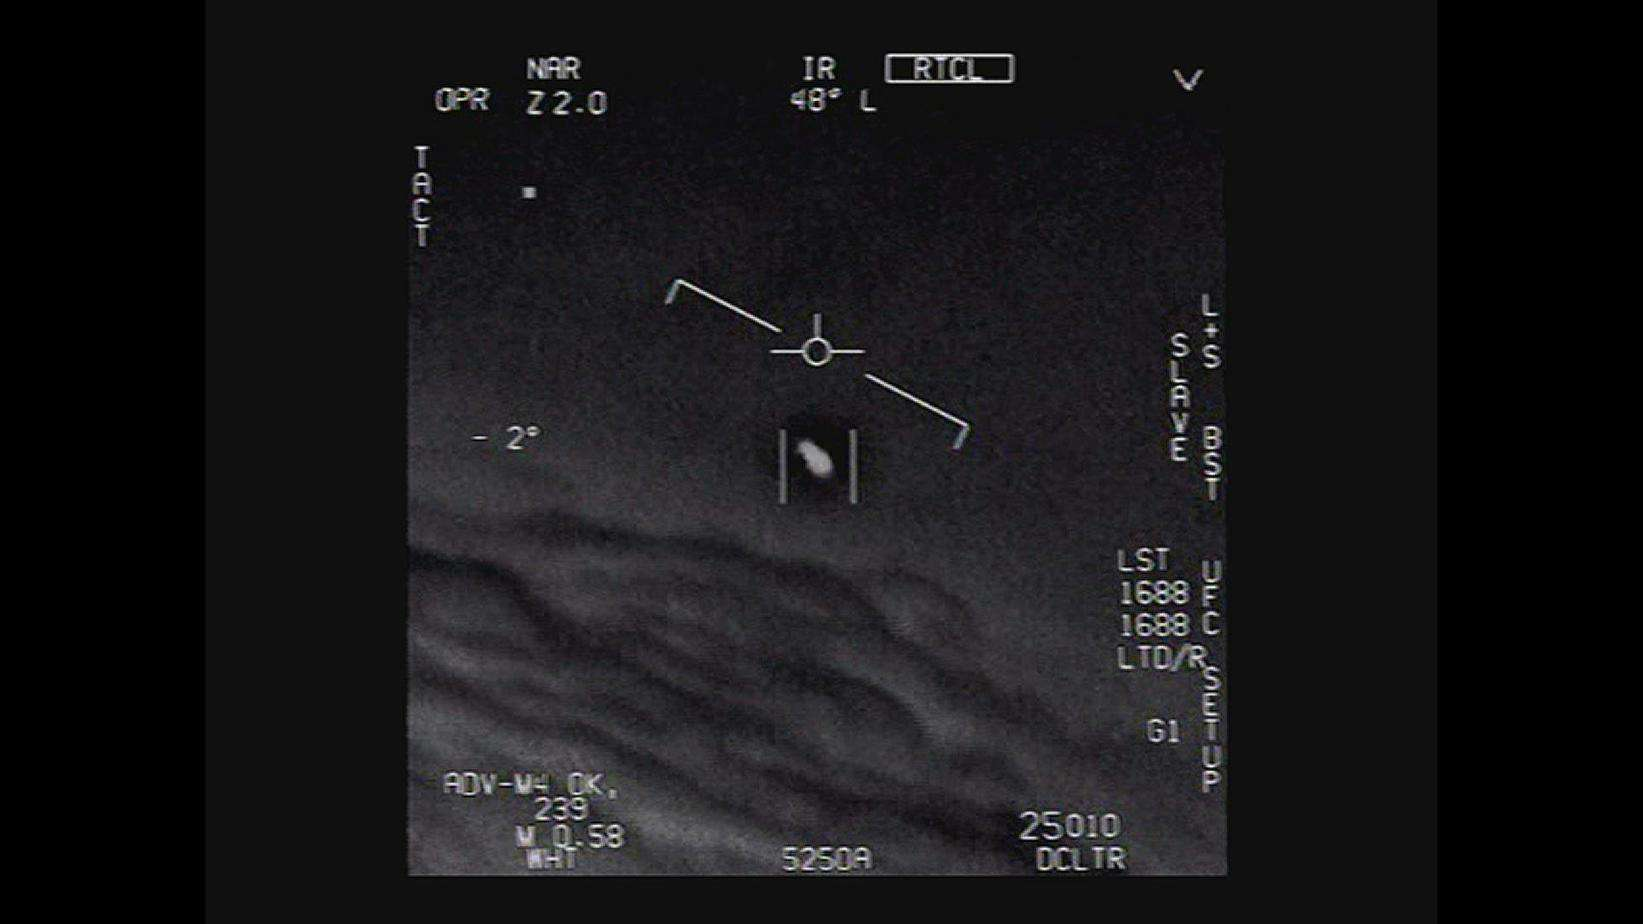 video rahasia penampakan UFO